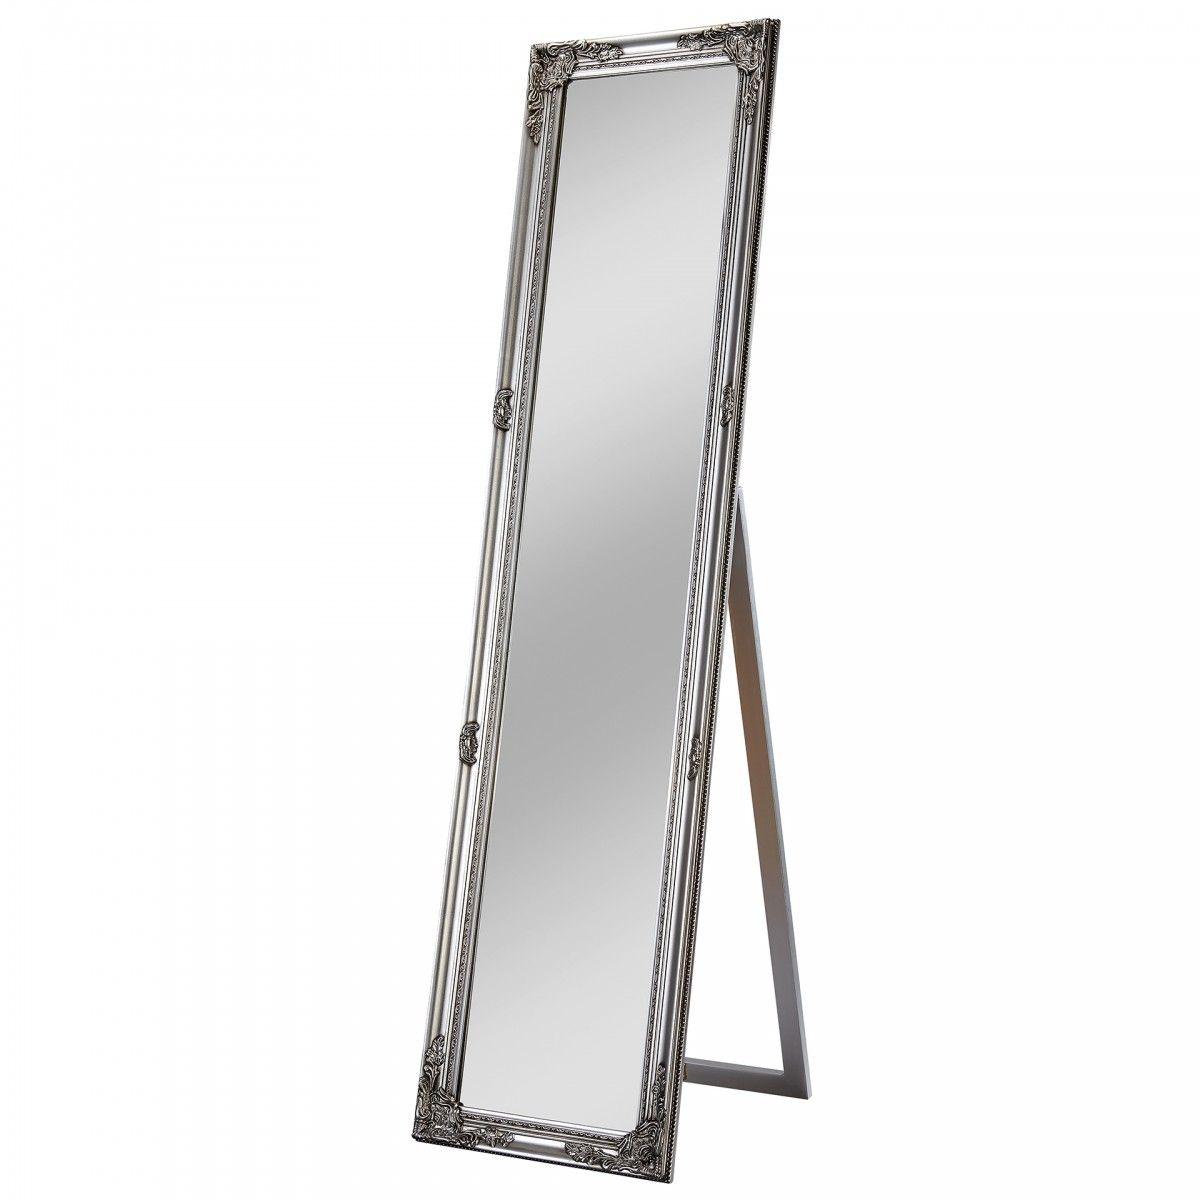 Standspiegel Vrangstrup 40x160 Silber Standspiegel Spiegel Schmuckschrank